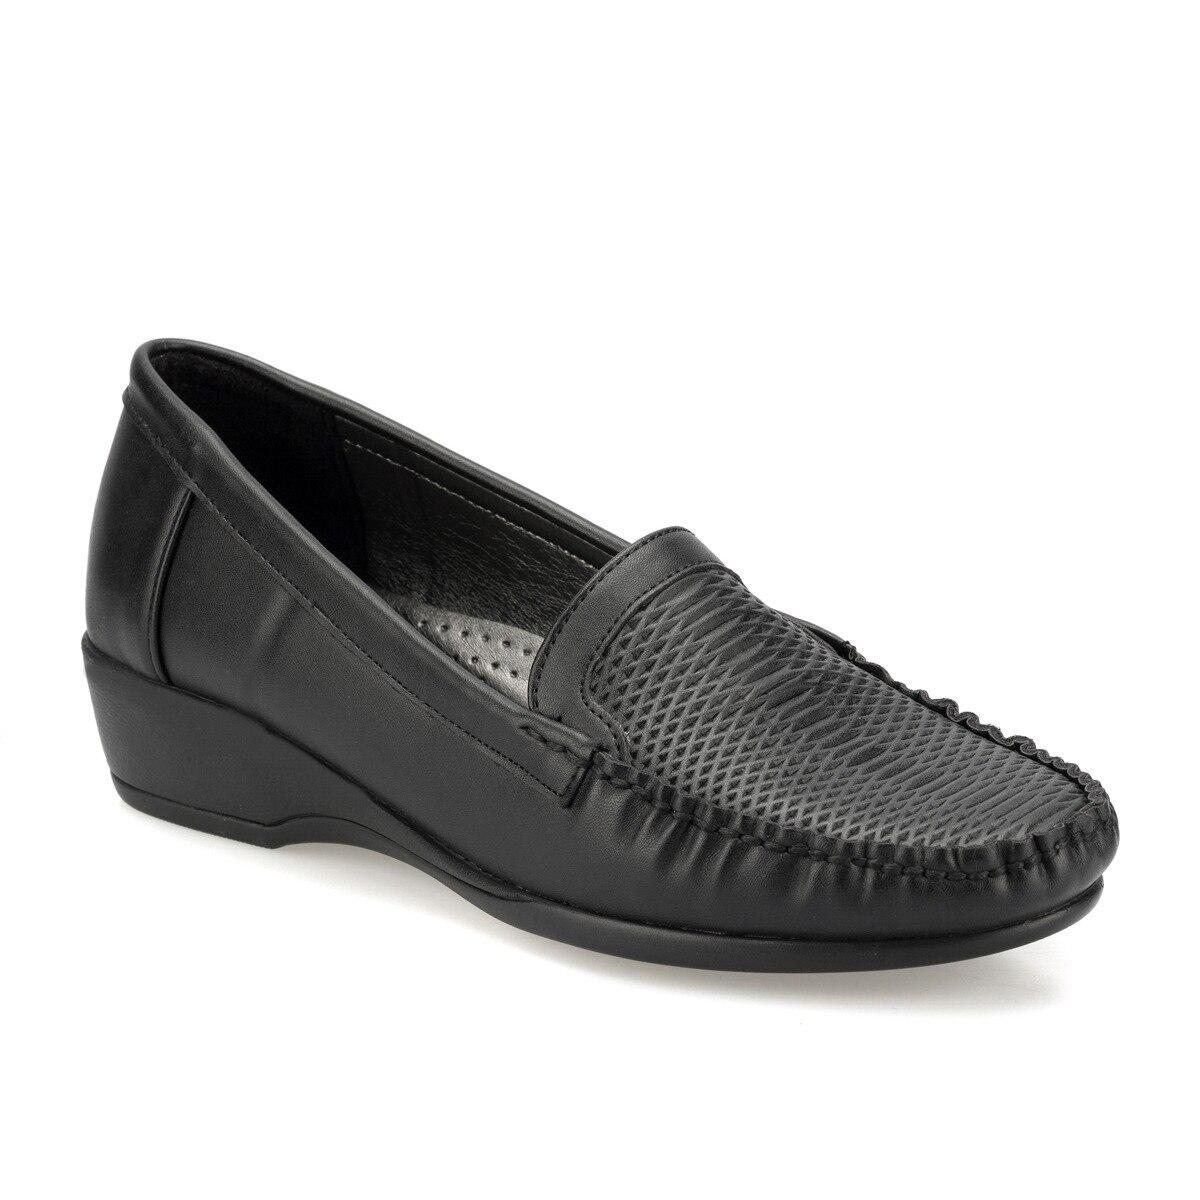 FLO 161097.Z Black Women Shoes Polaris